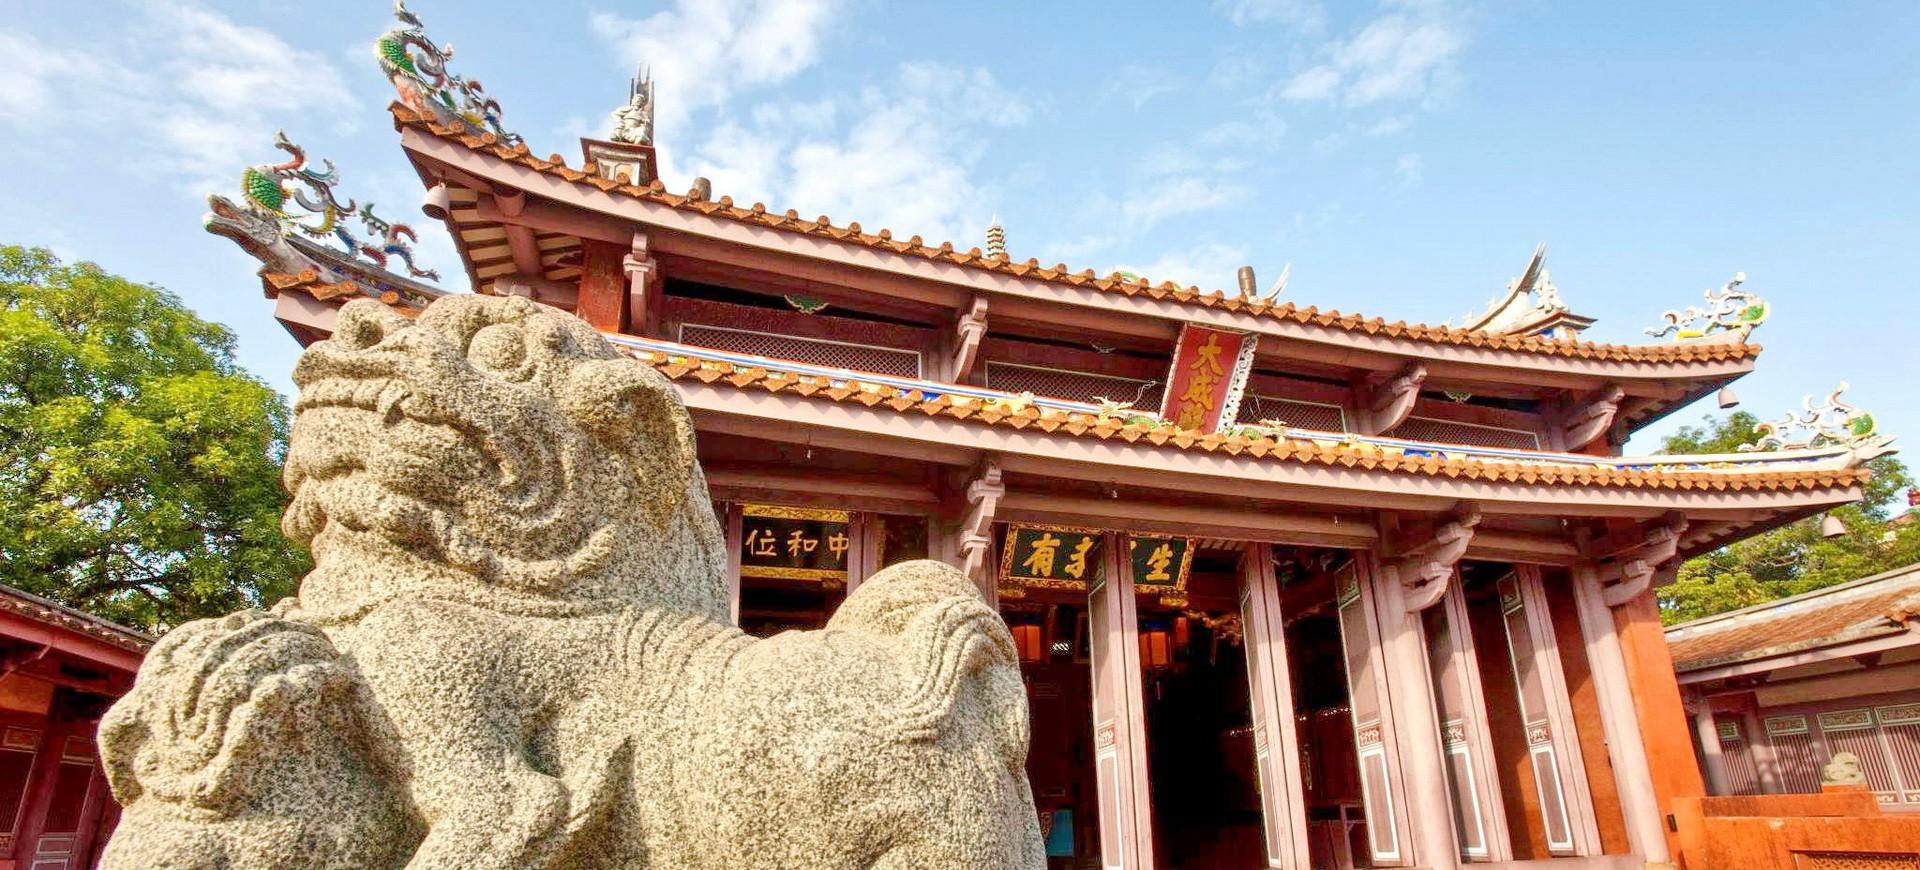 Temple de Confucius à Tainan  à Taiwan